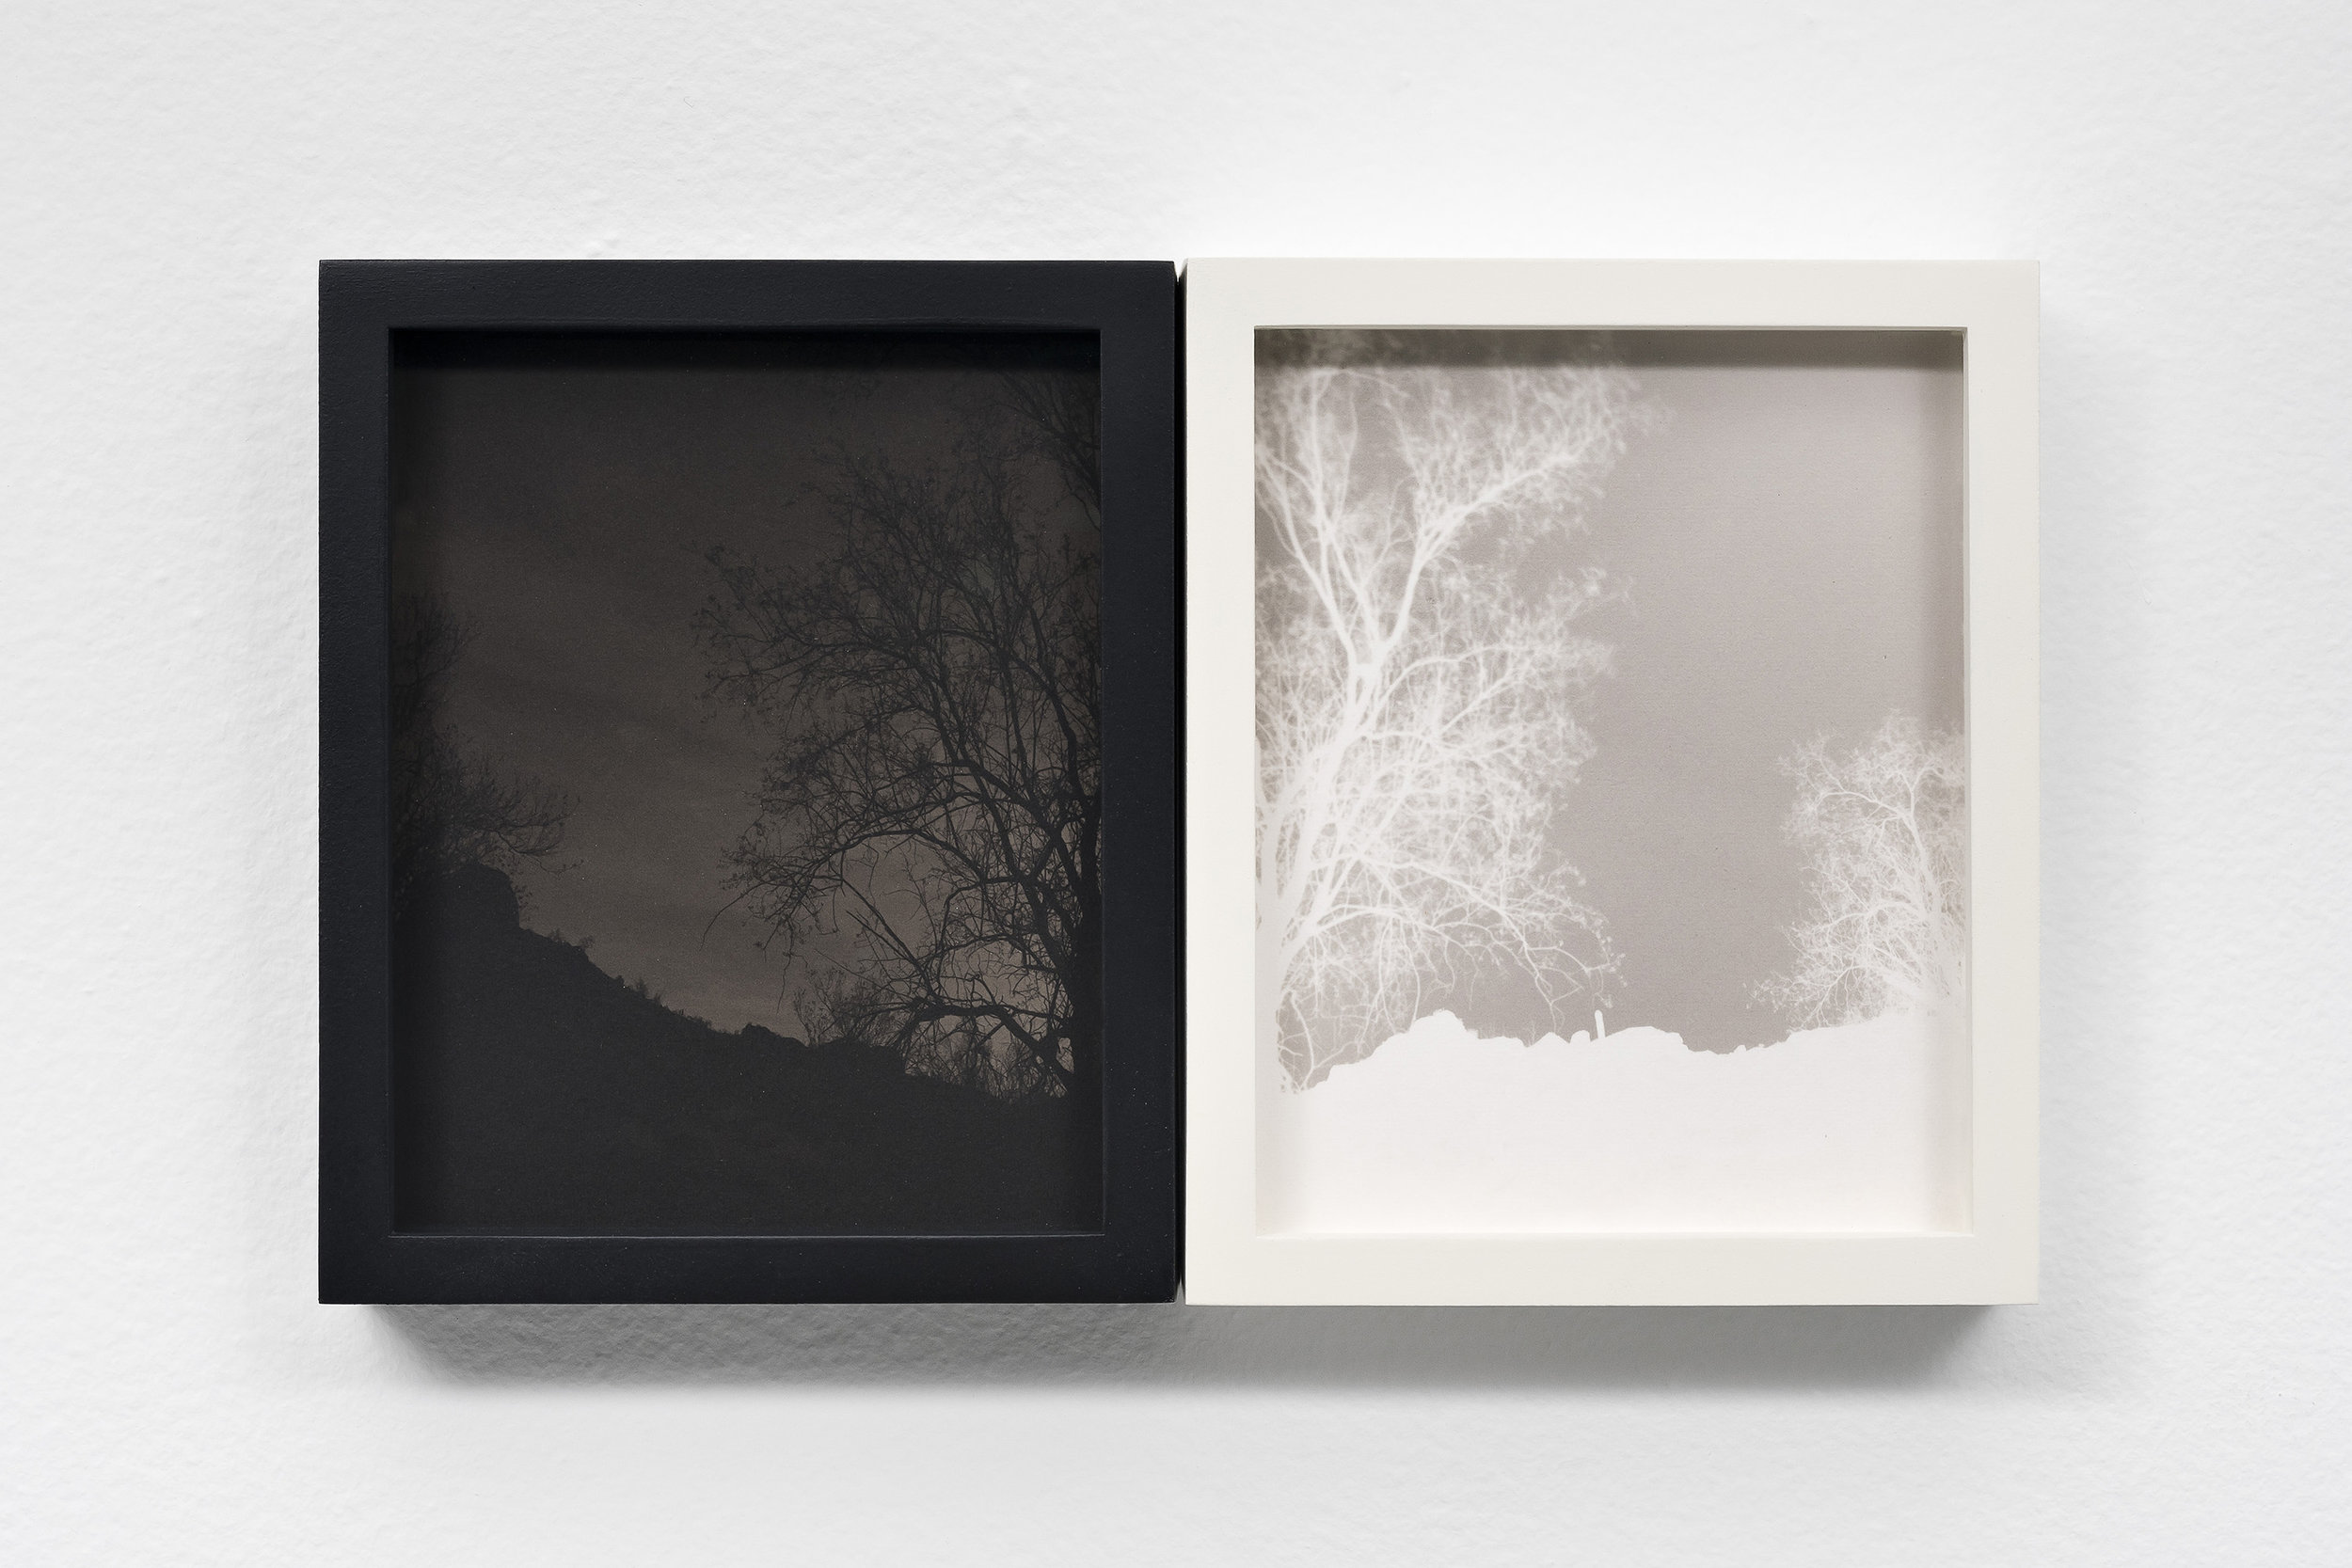 SCOTT B. DAVIS  Ironwood Tree on Volcanic Soil,  2018 Unique paper negative palladium / platinum prints, diptych 5 x 8 inches